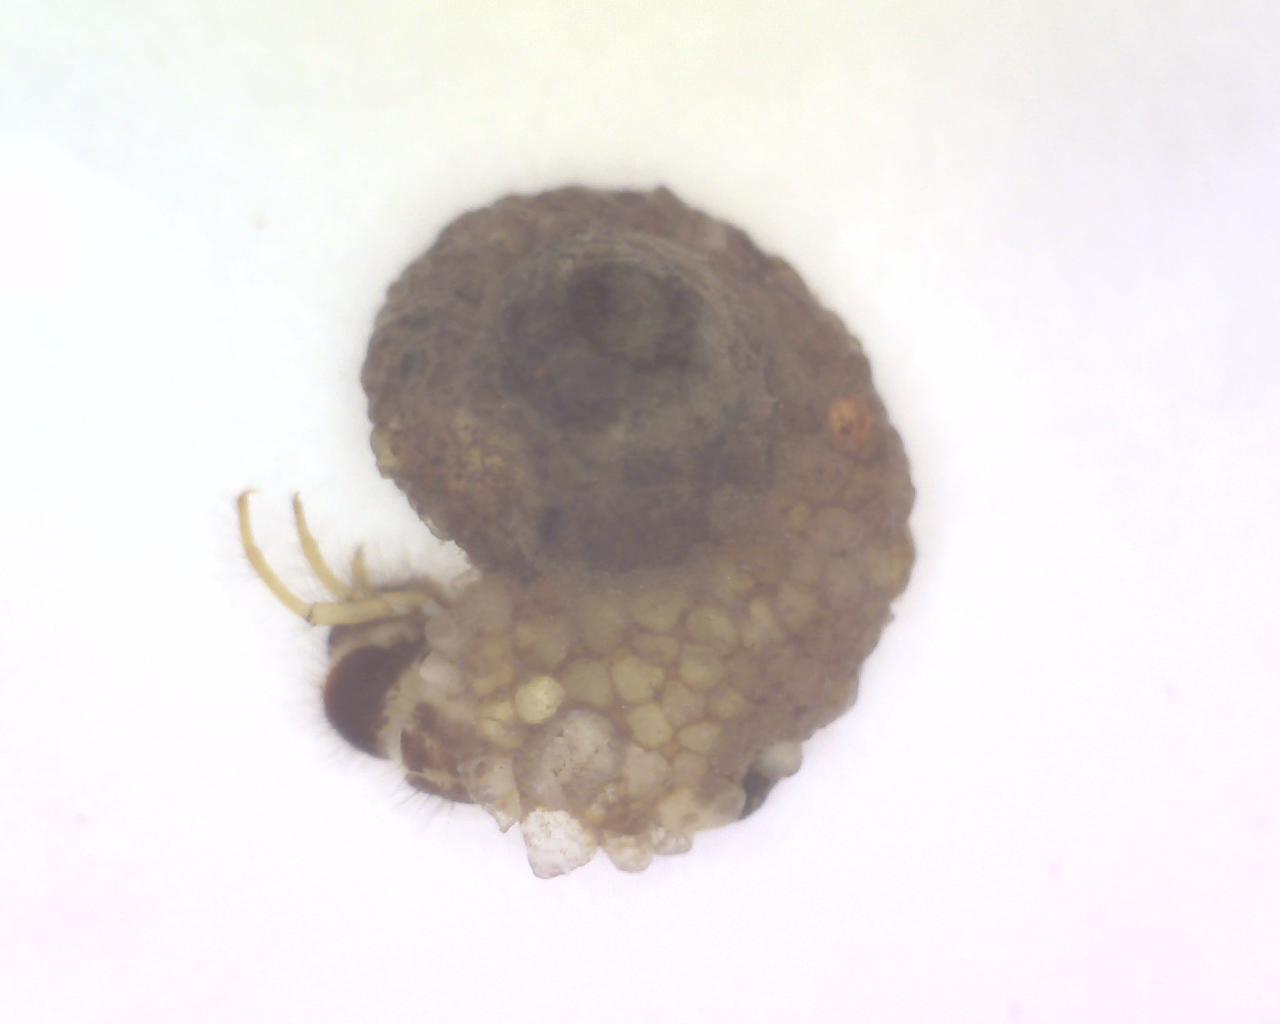 Helicopsychidae (Snail Case-Maker Caddisfly)